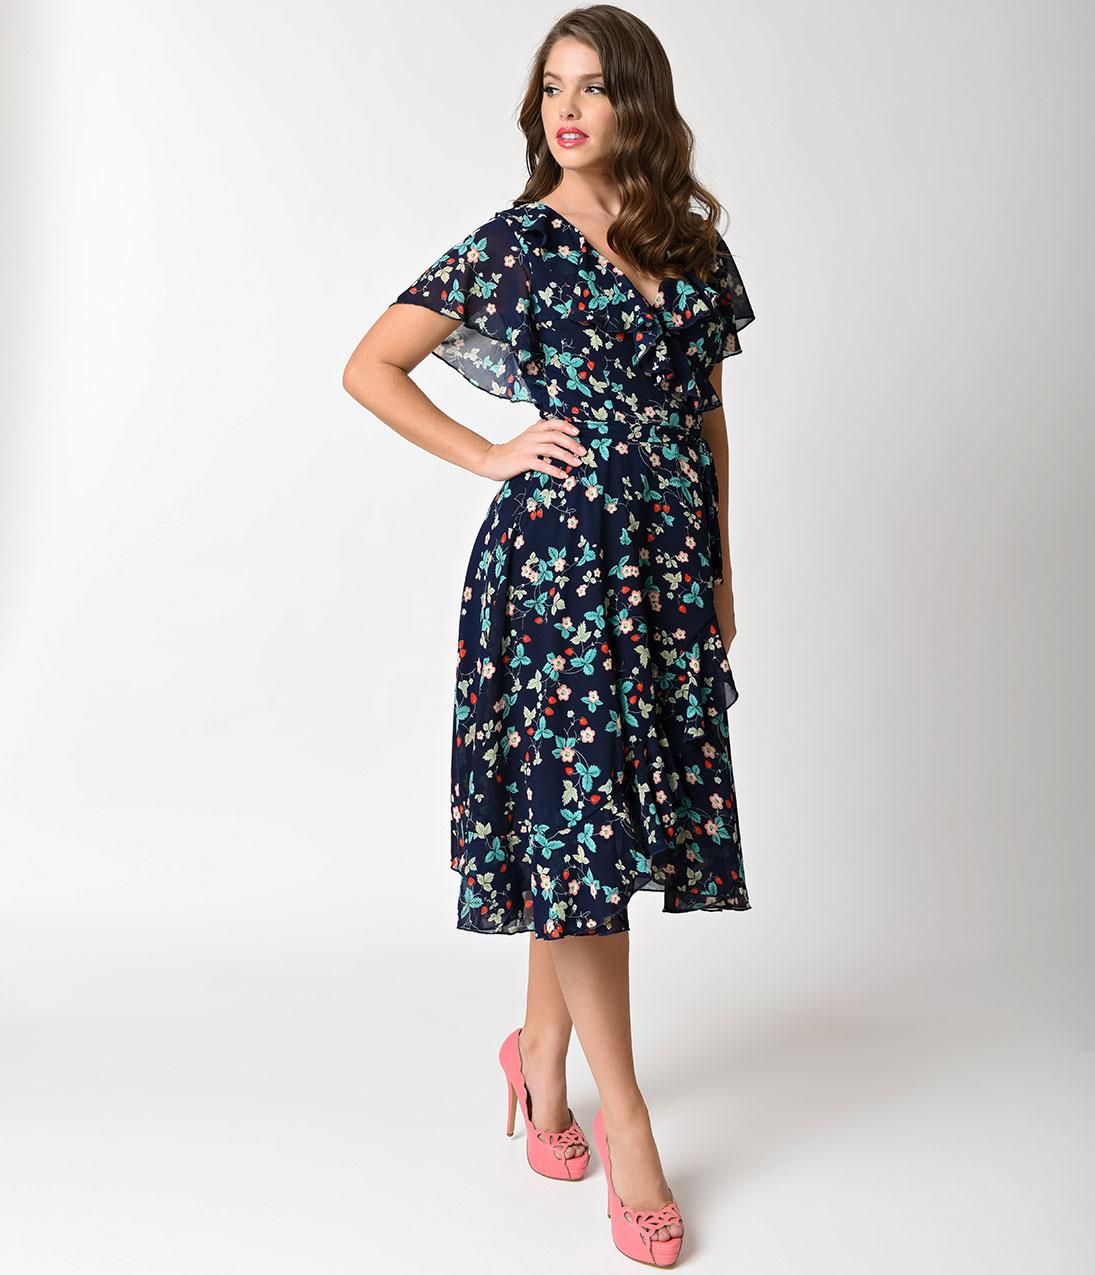 Dressing the original way courtesy of the 1940s dresses